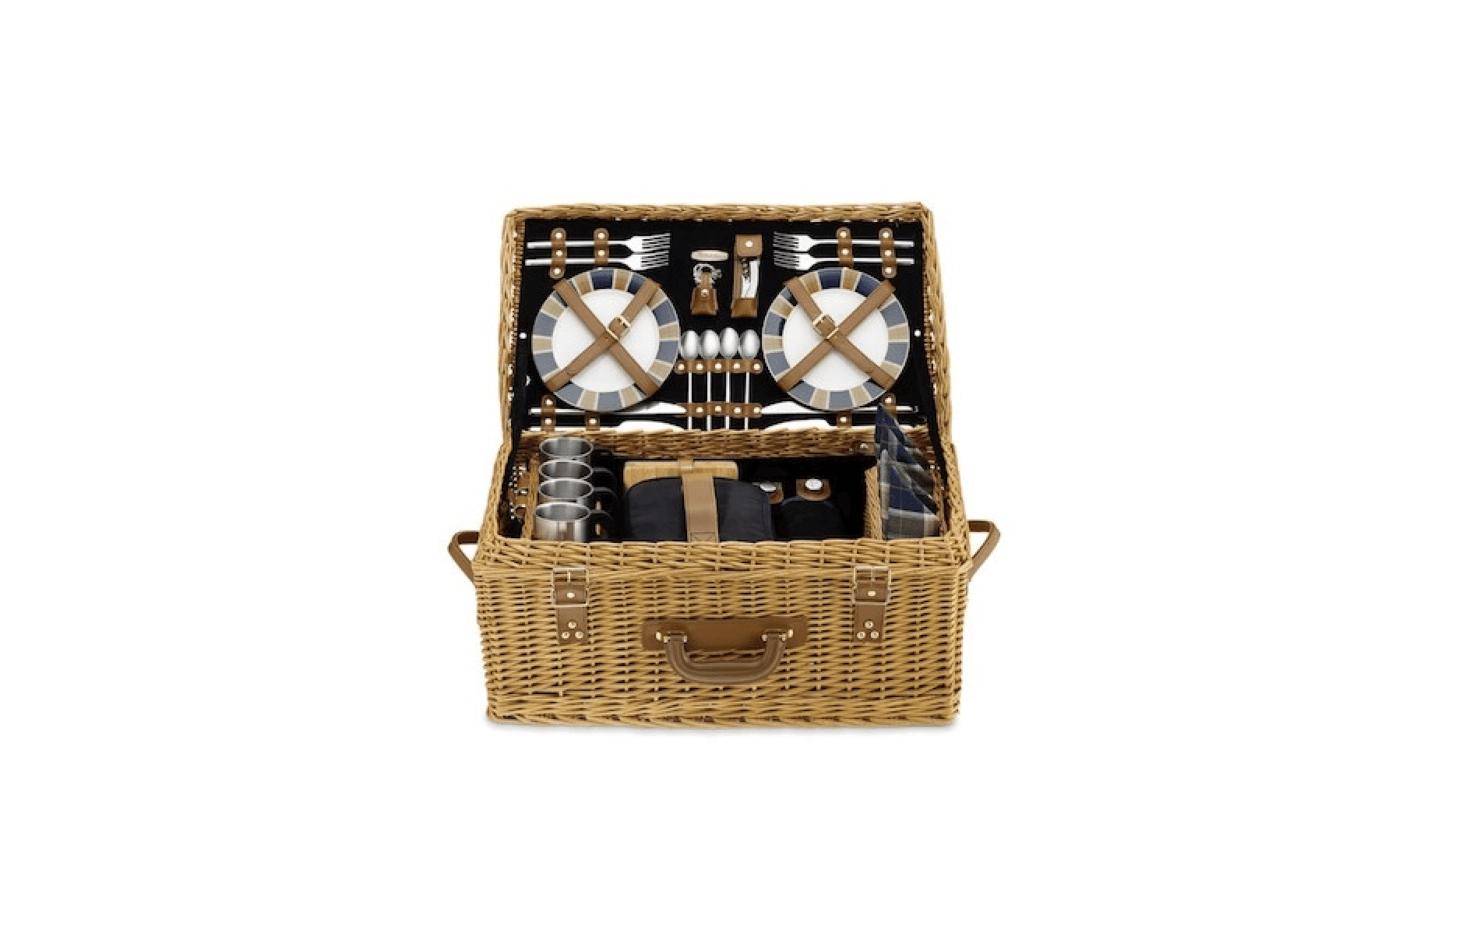 10 Easy Pieces: Picnic Baskets